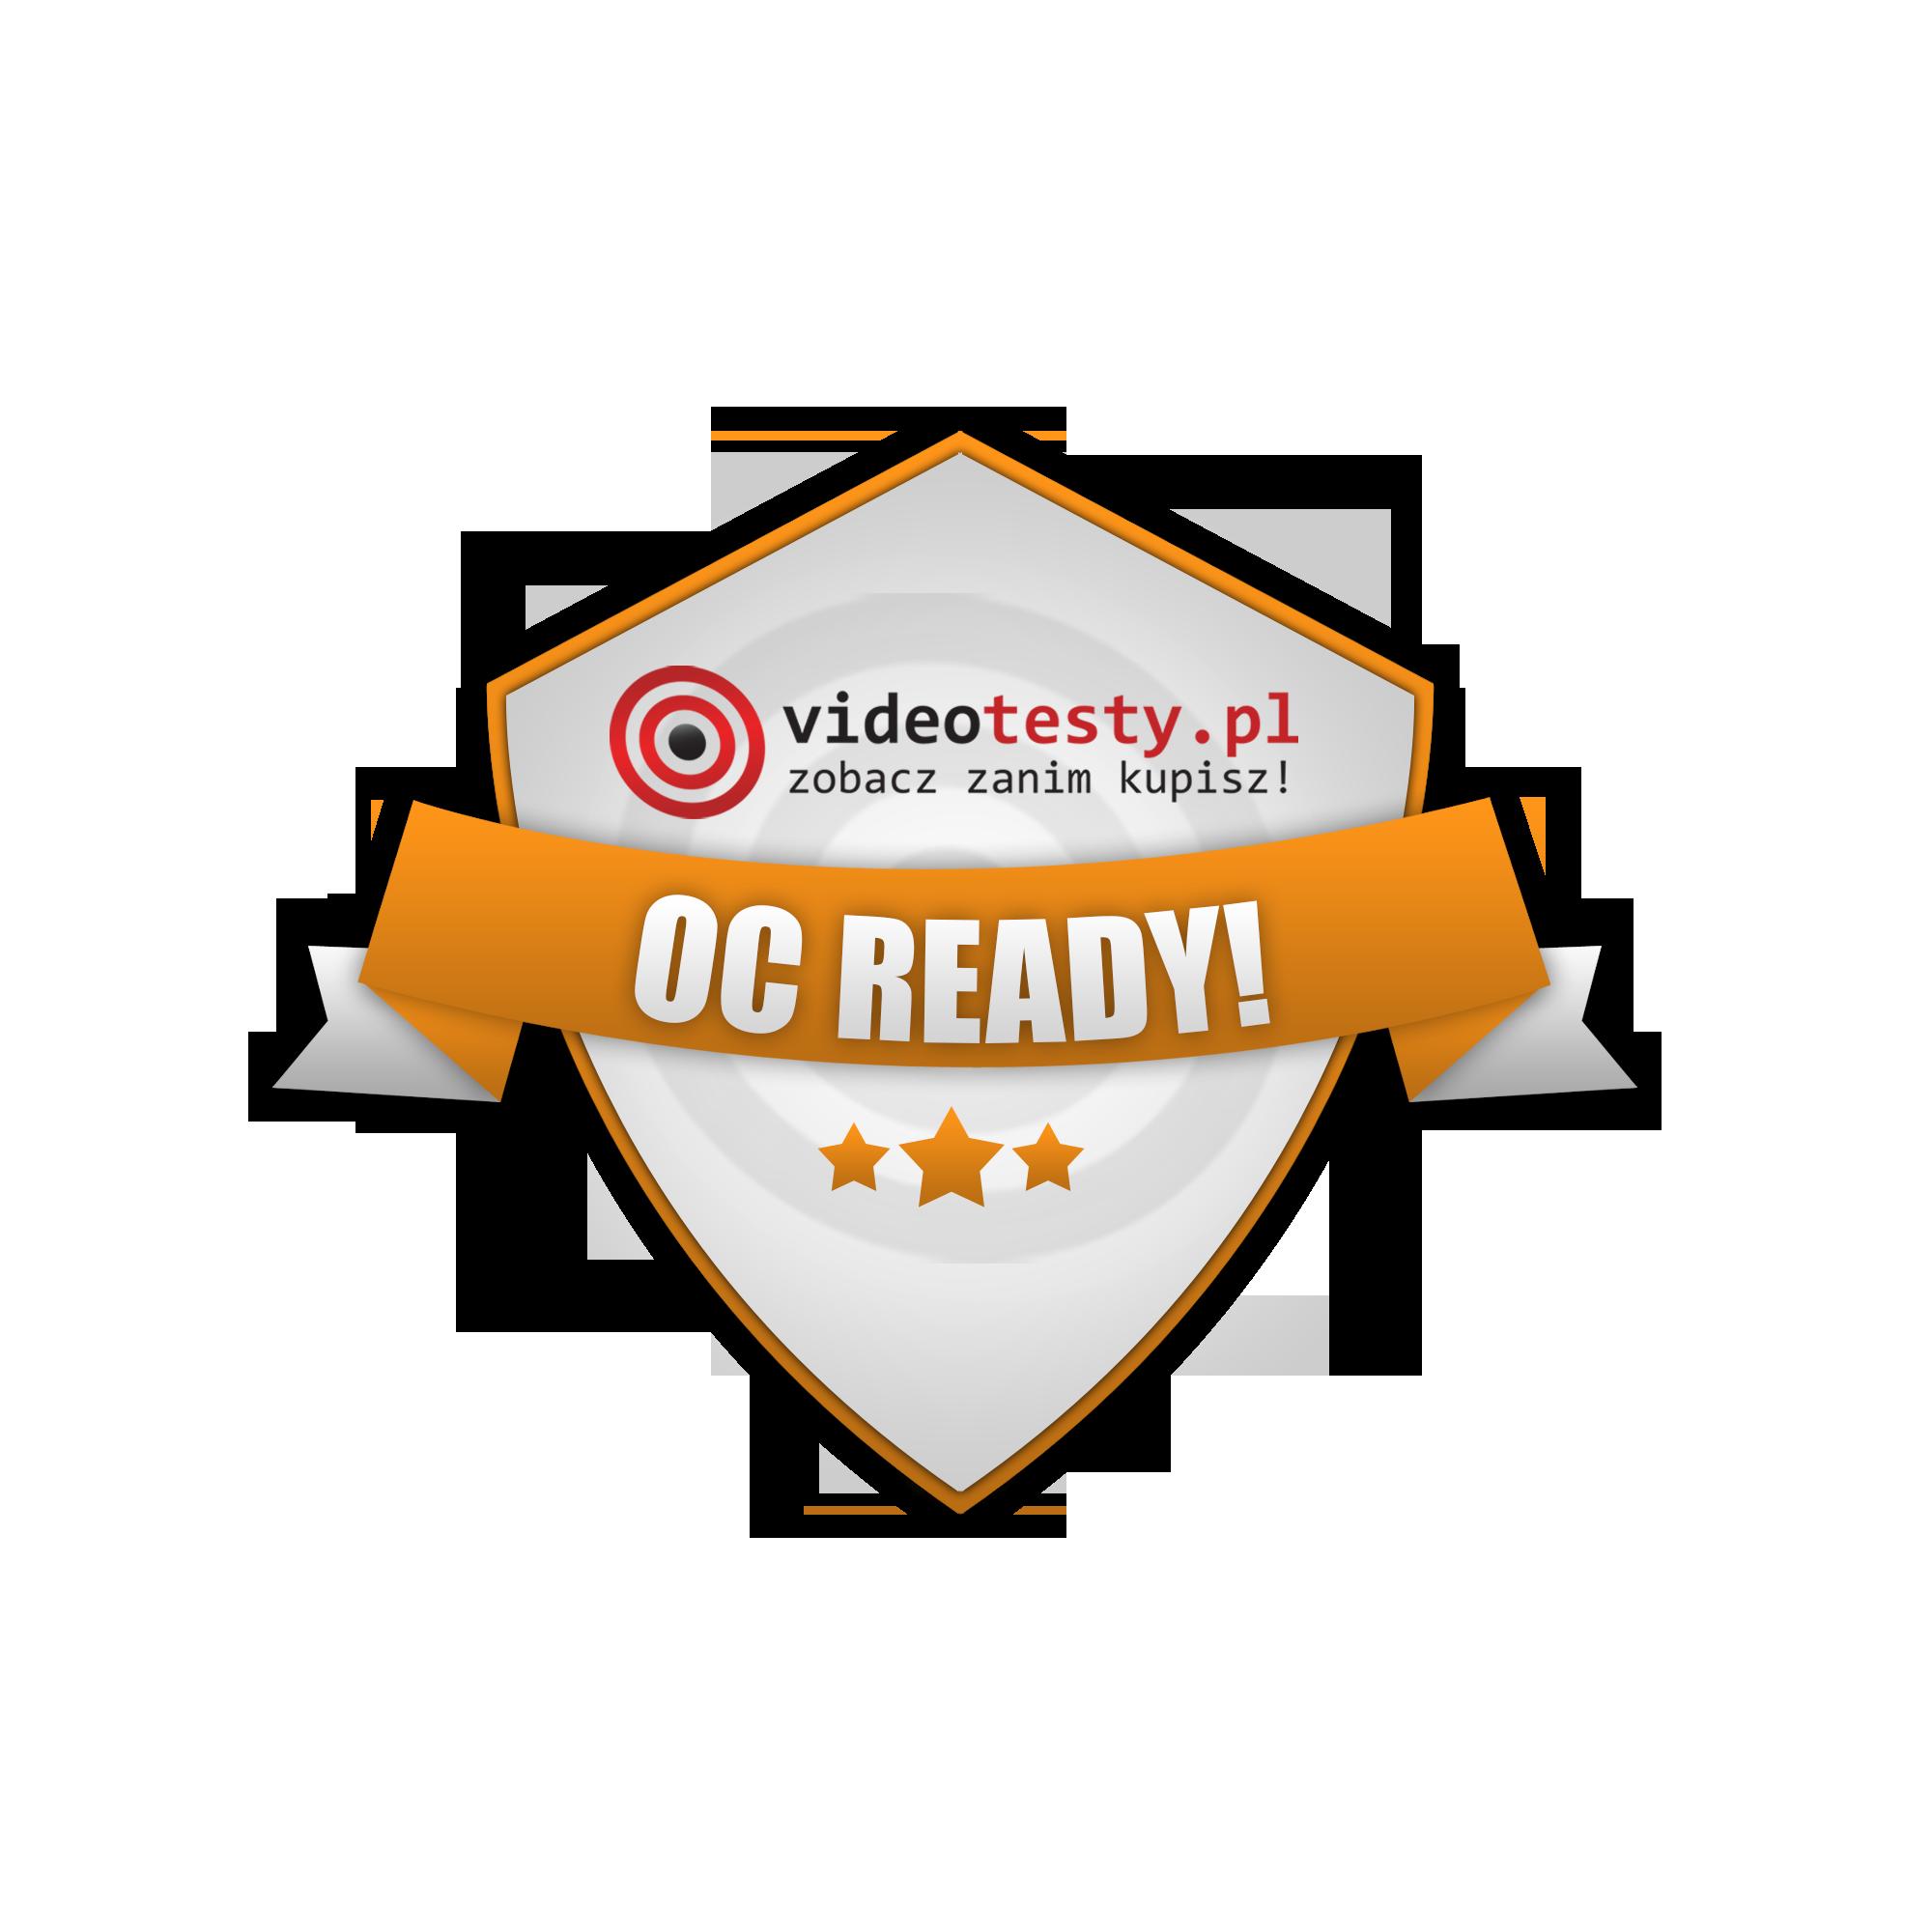 OC Ready Videotesty